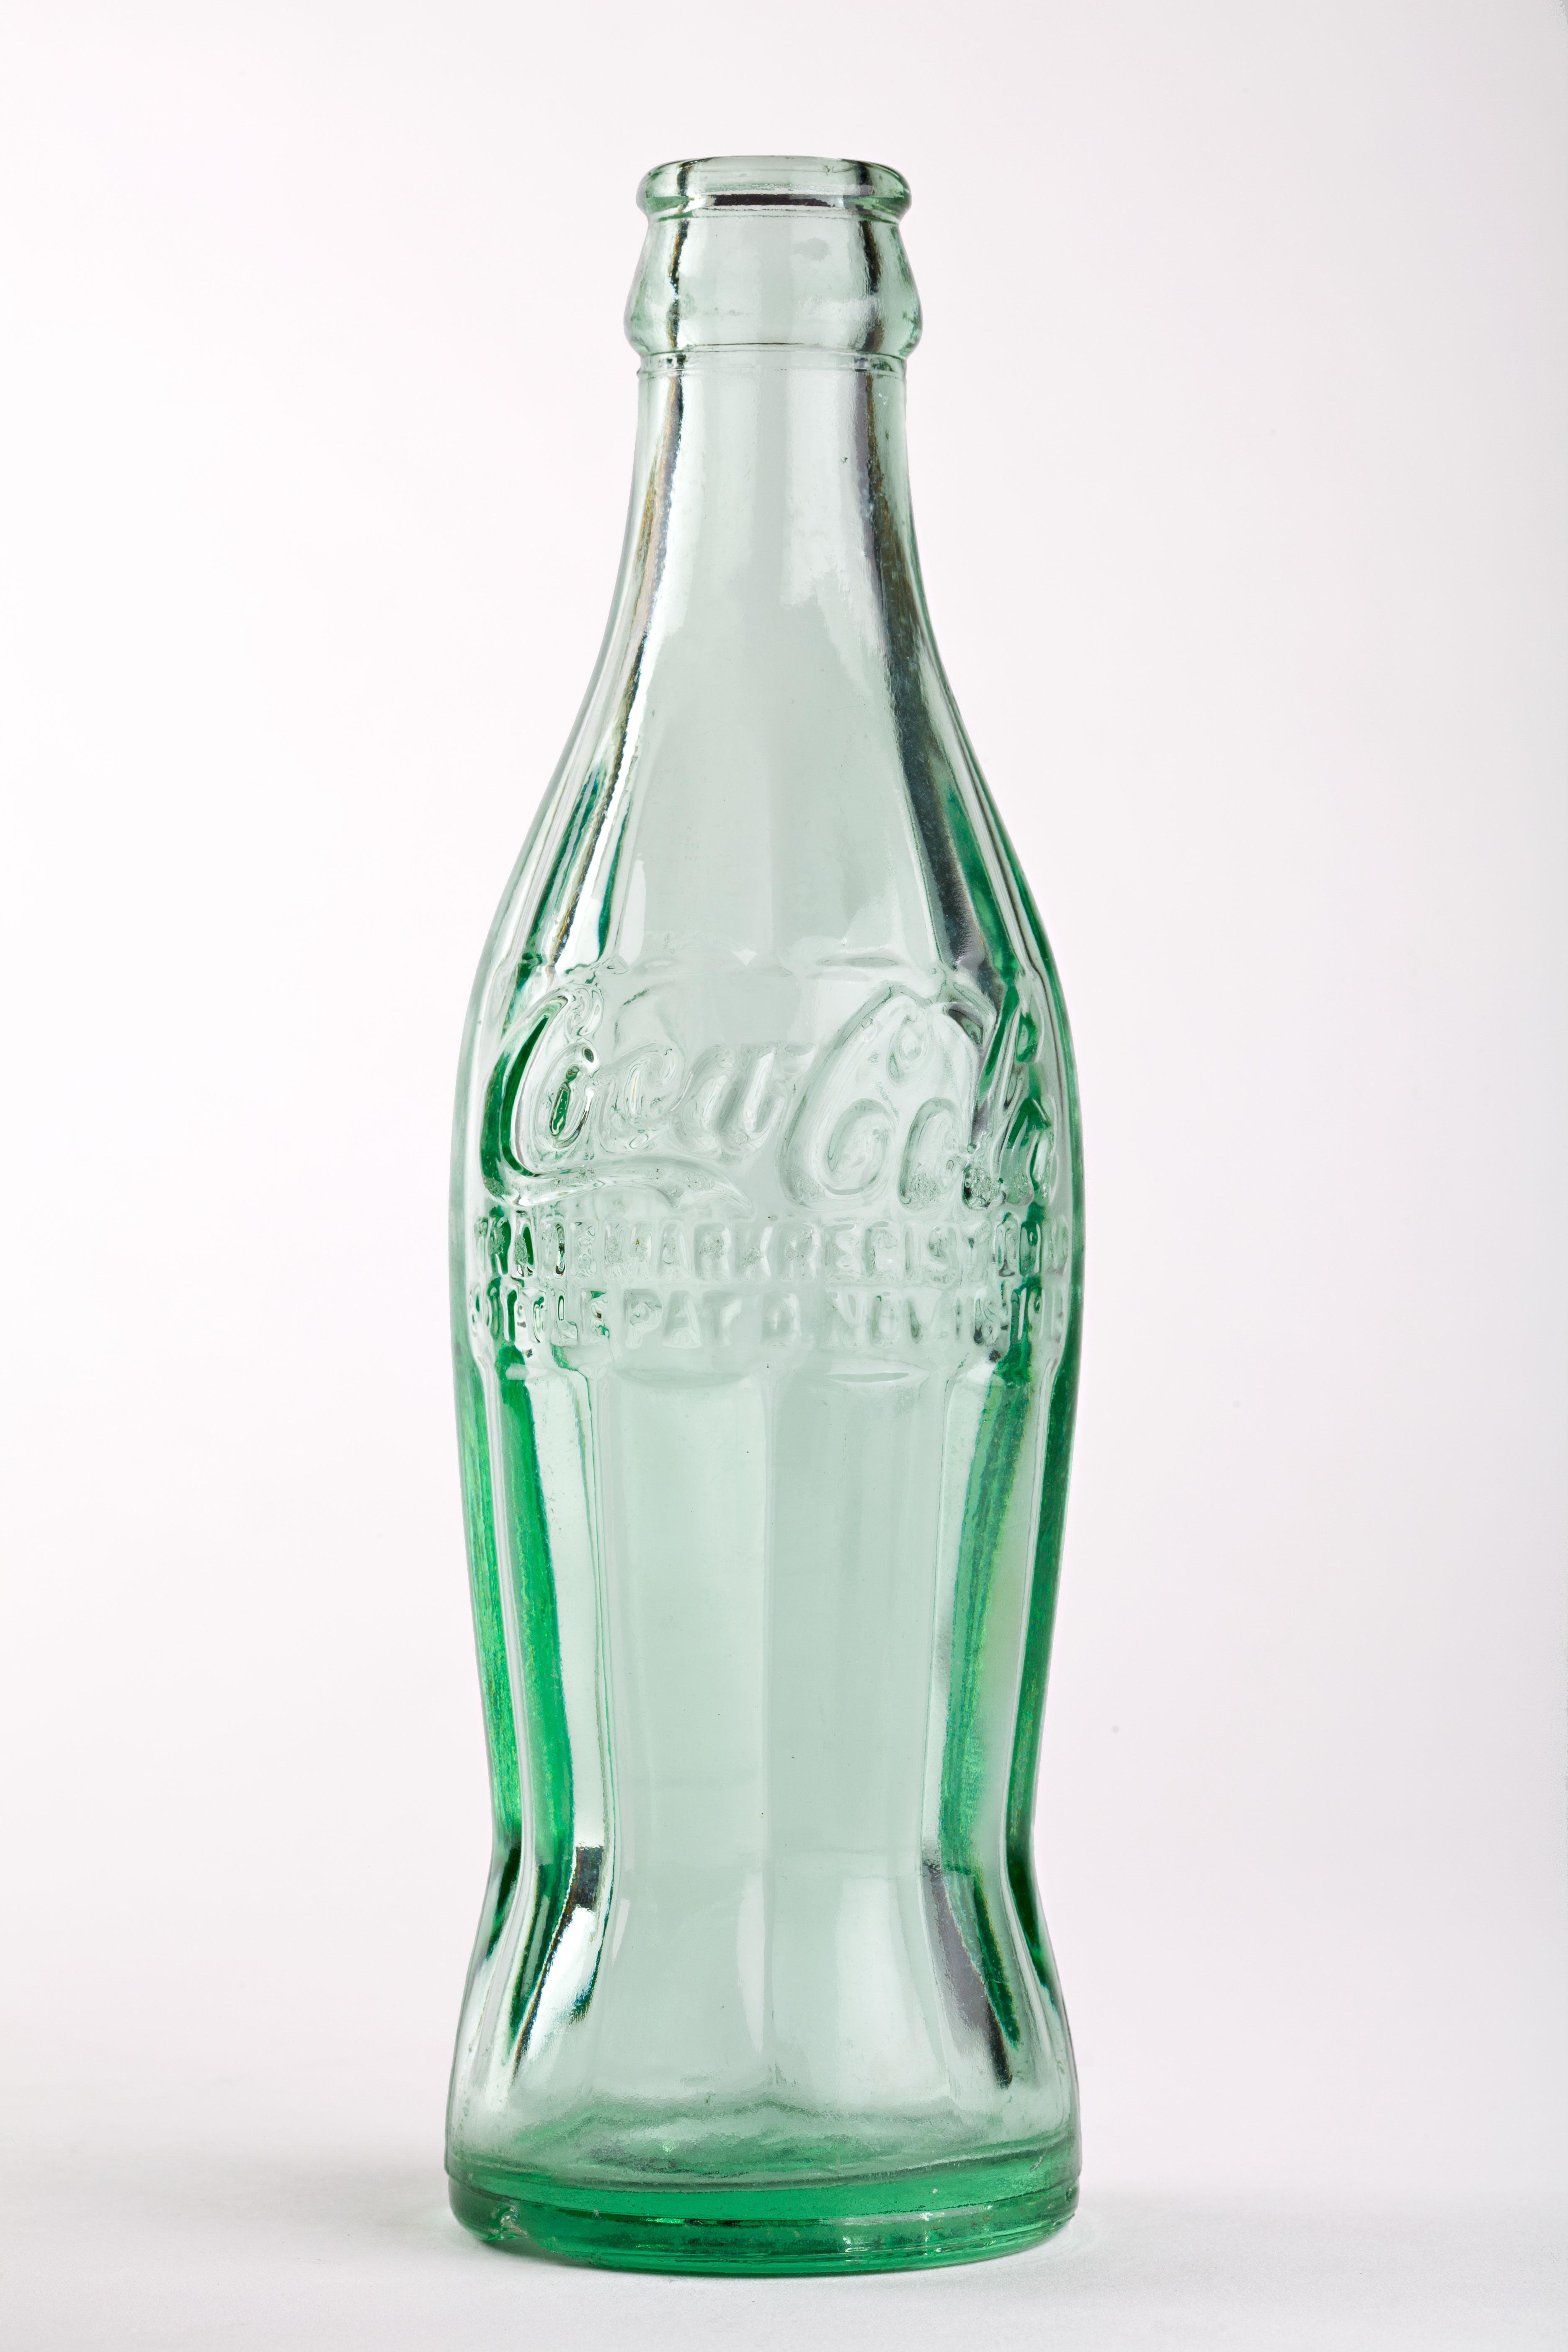 Drawn bottle Design Explores REVIEW® the PEACH